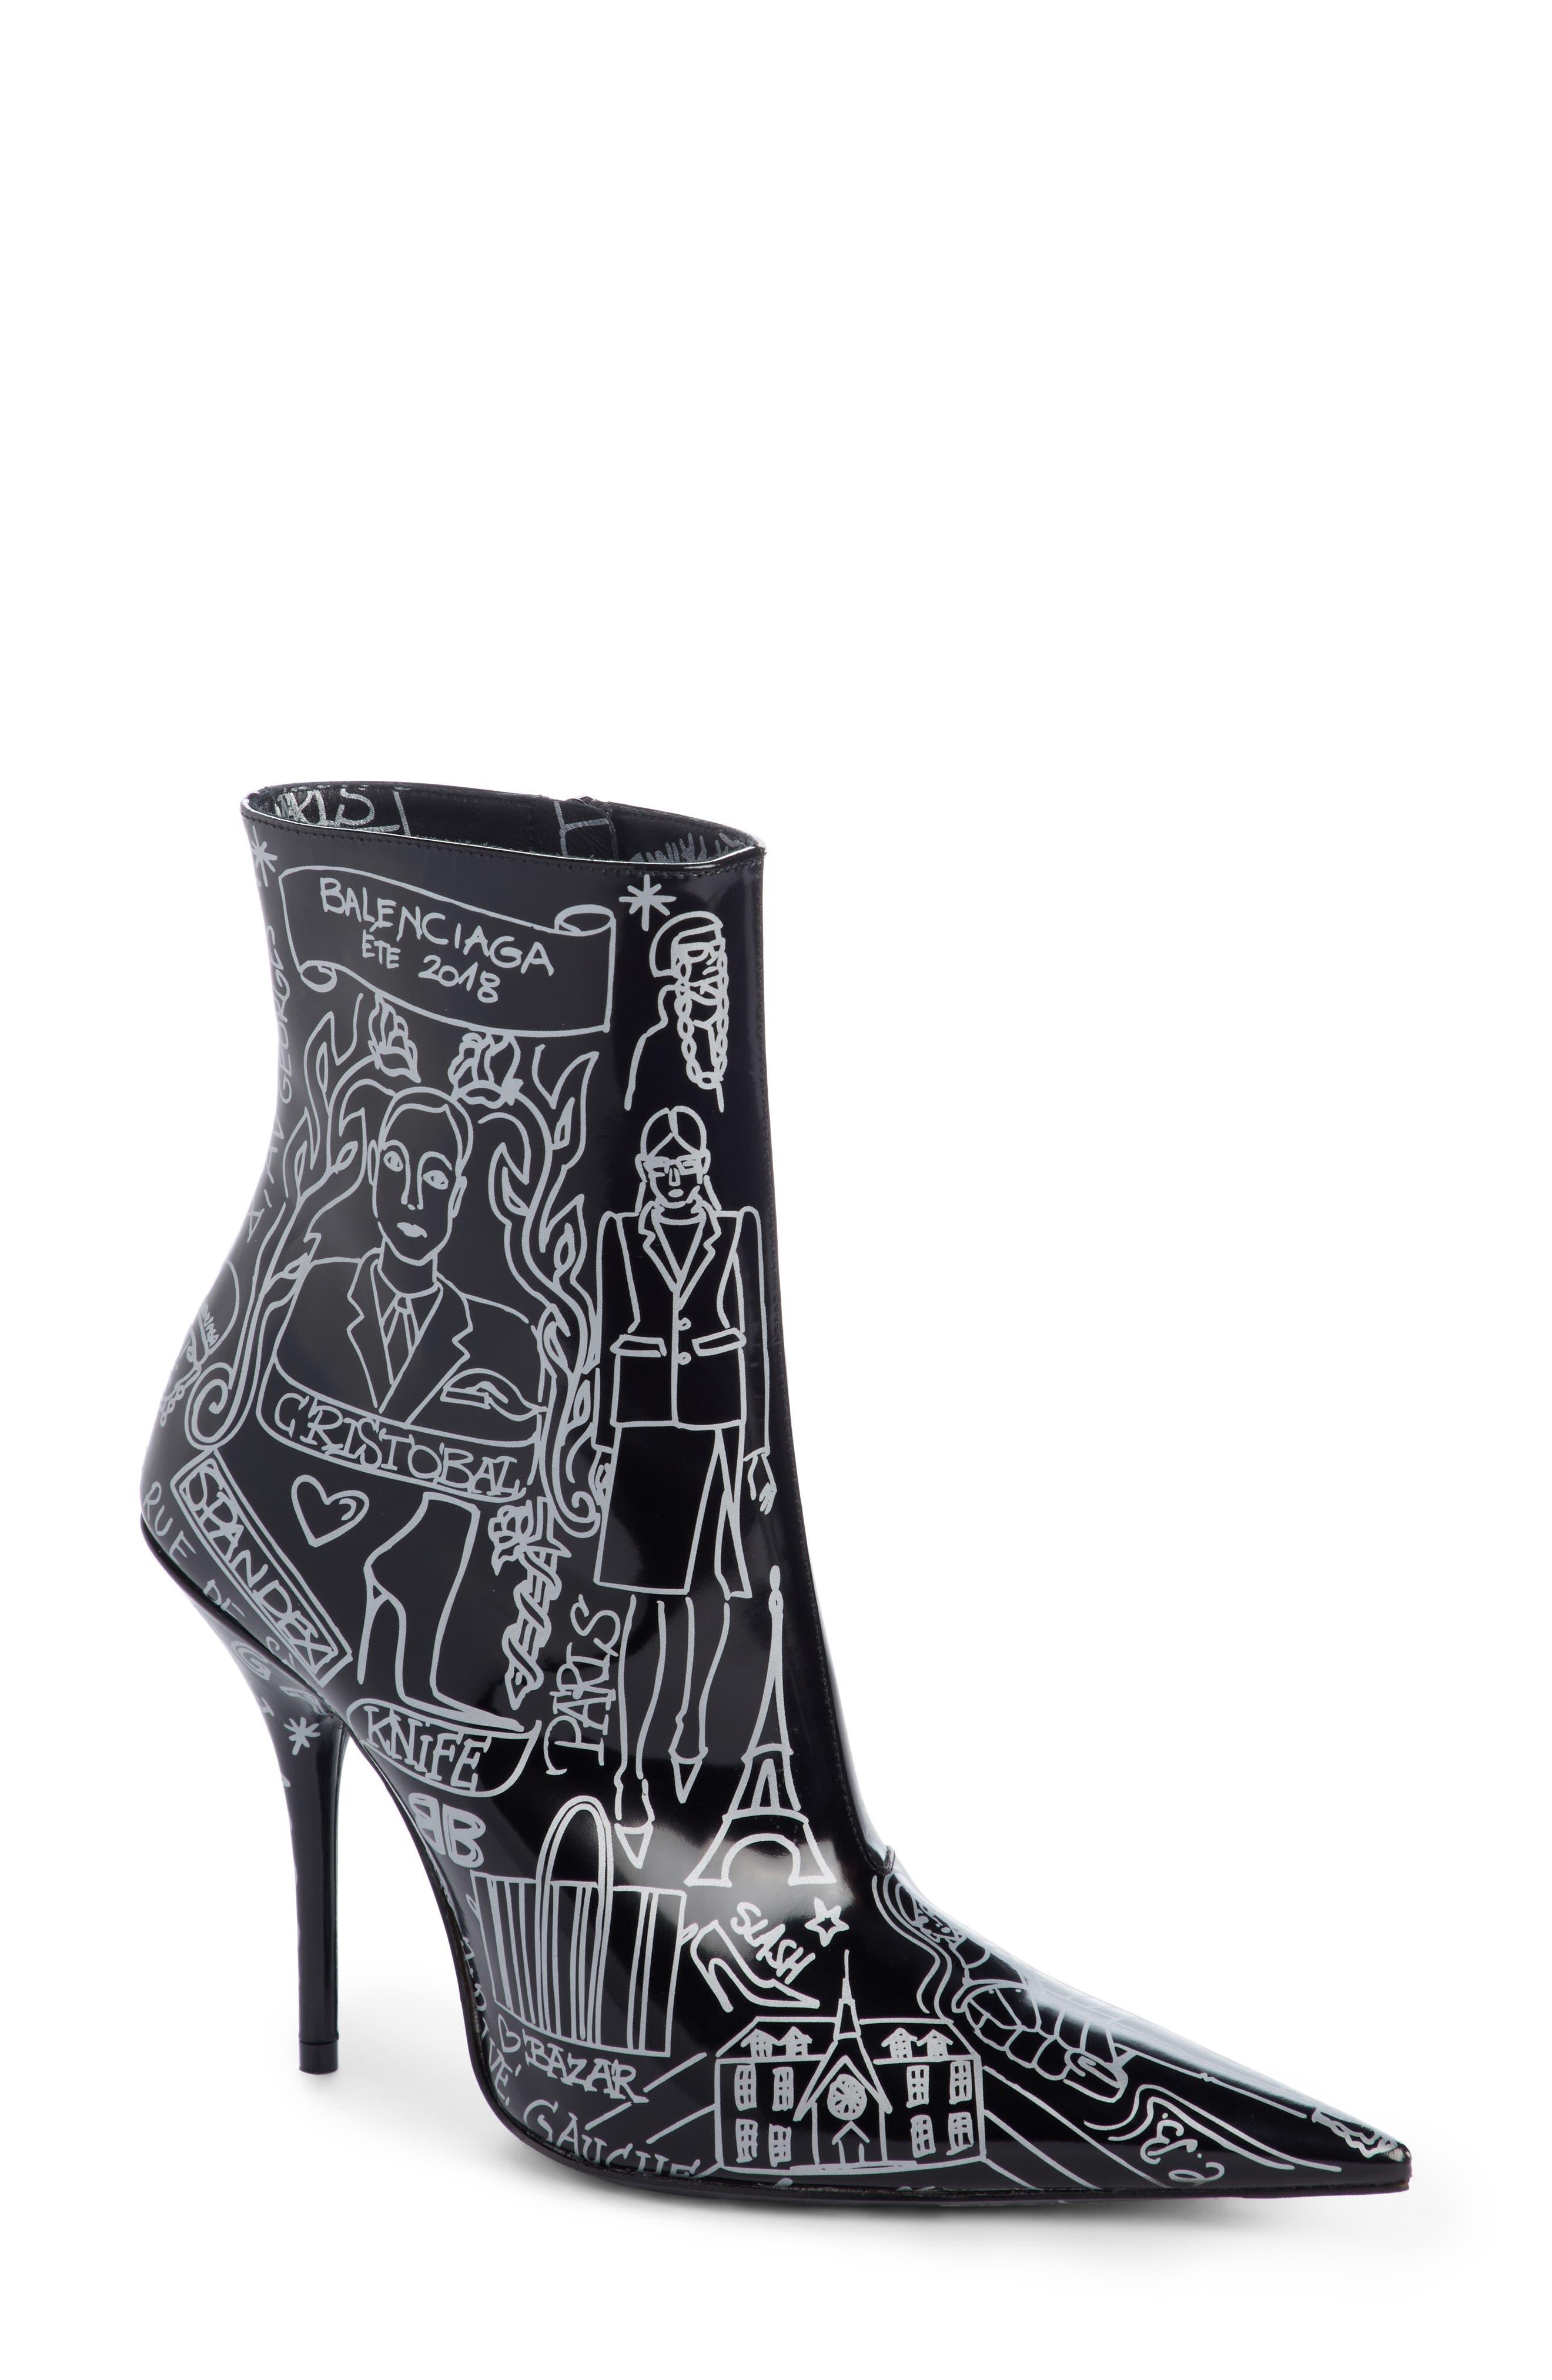 Alternate Image 1 Selected - Balenciaga Print Pointy Toe Bootie (Women)